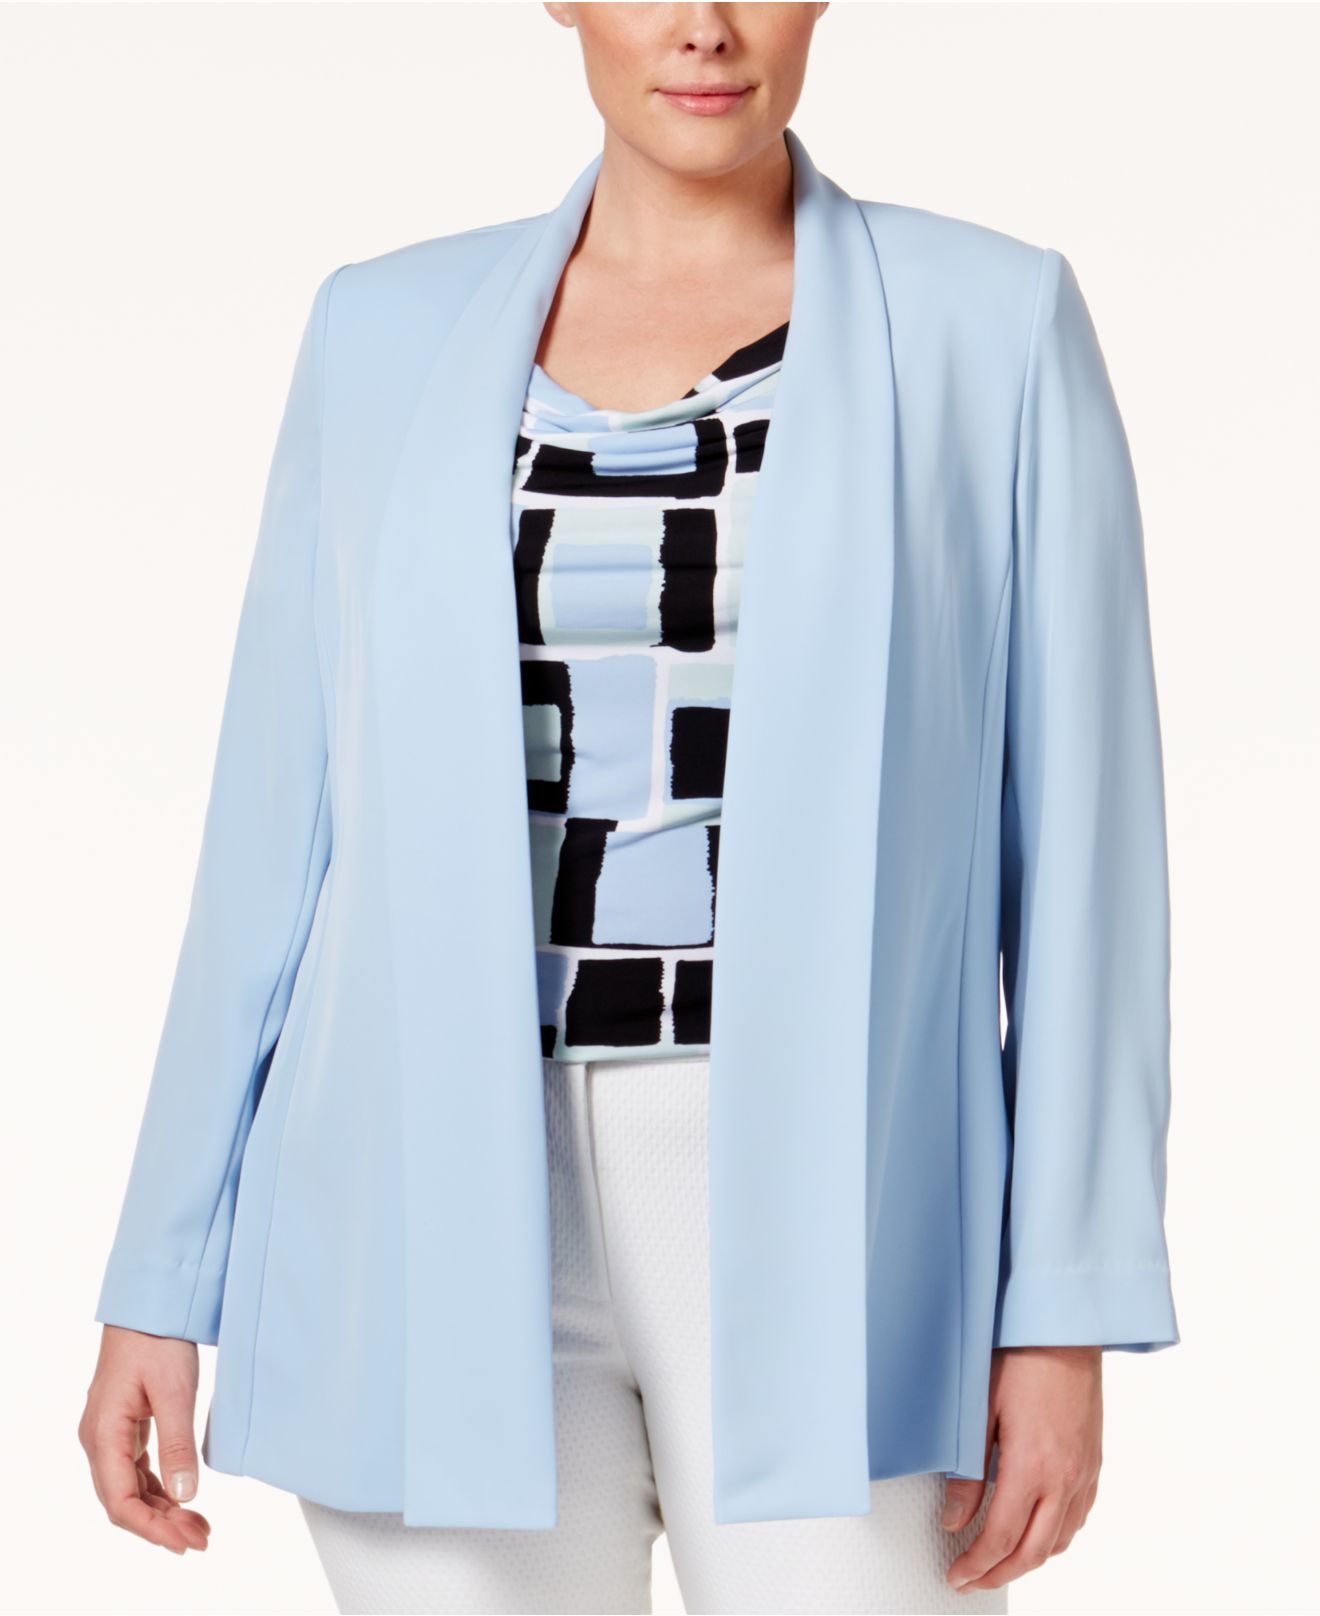 f29ed21059aea Lyst - Calvin Klein Plus Size Open-front Jacket in Blue